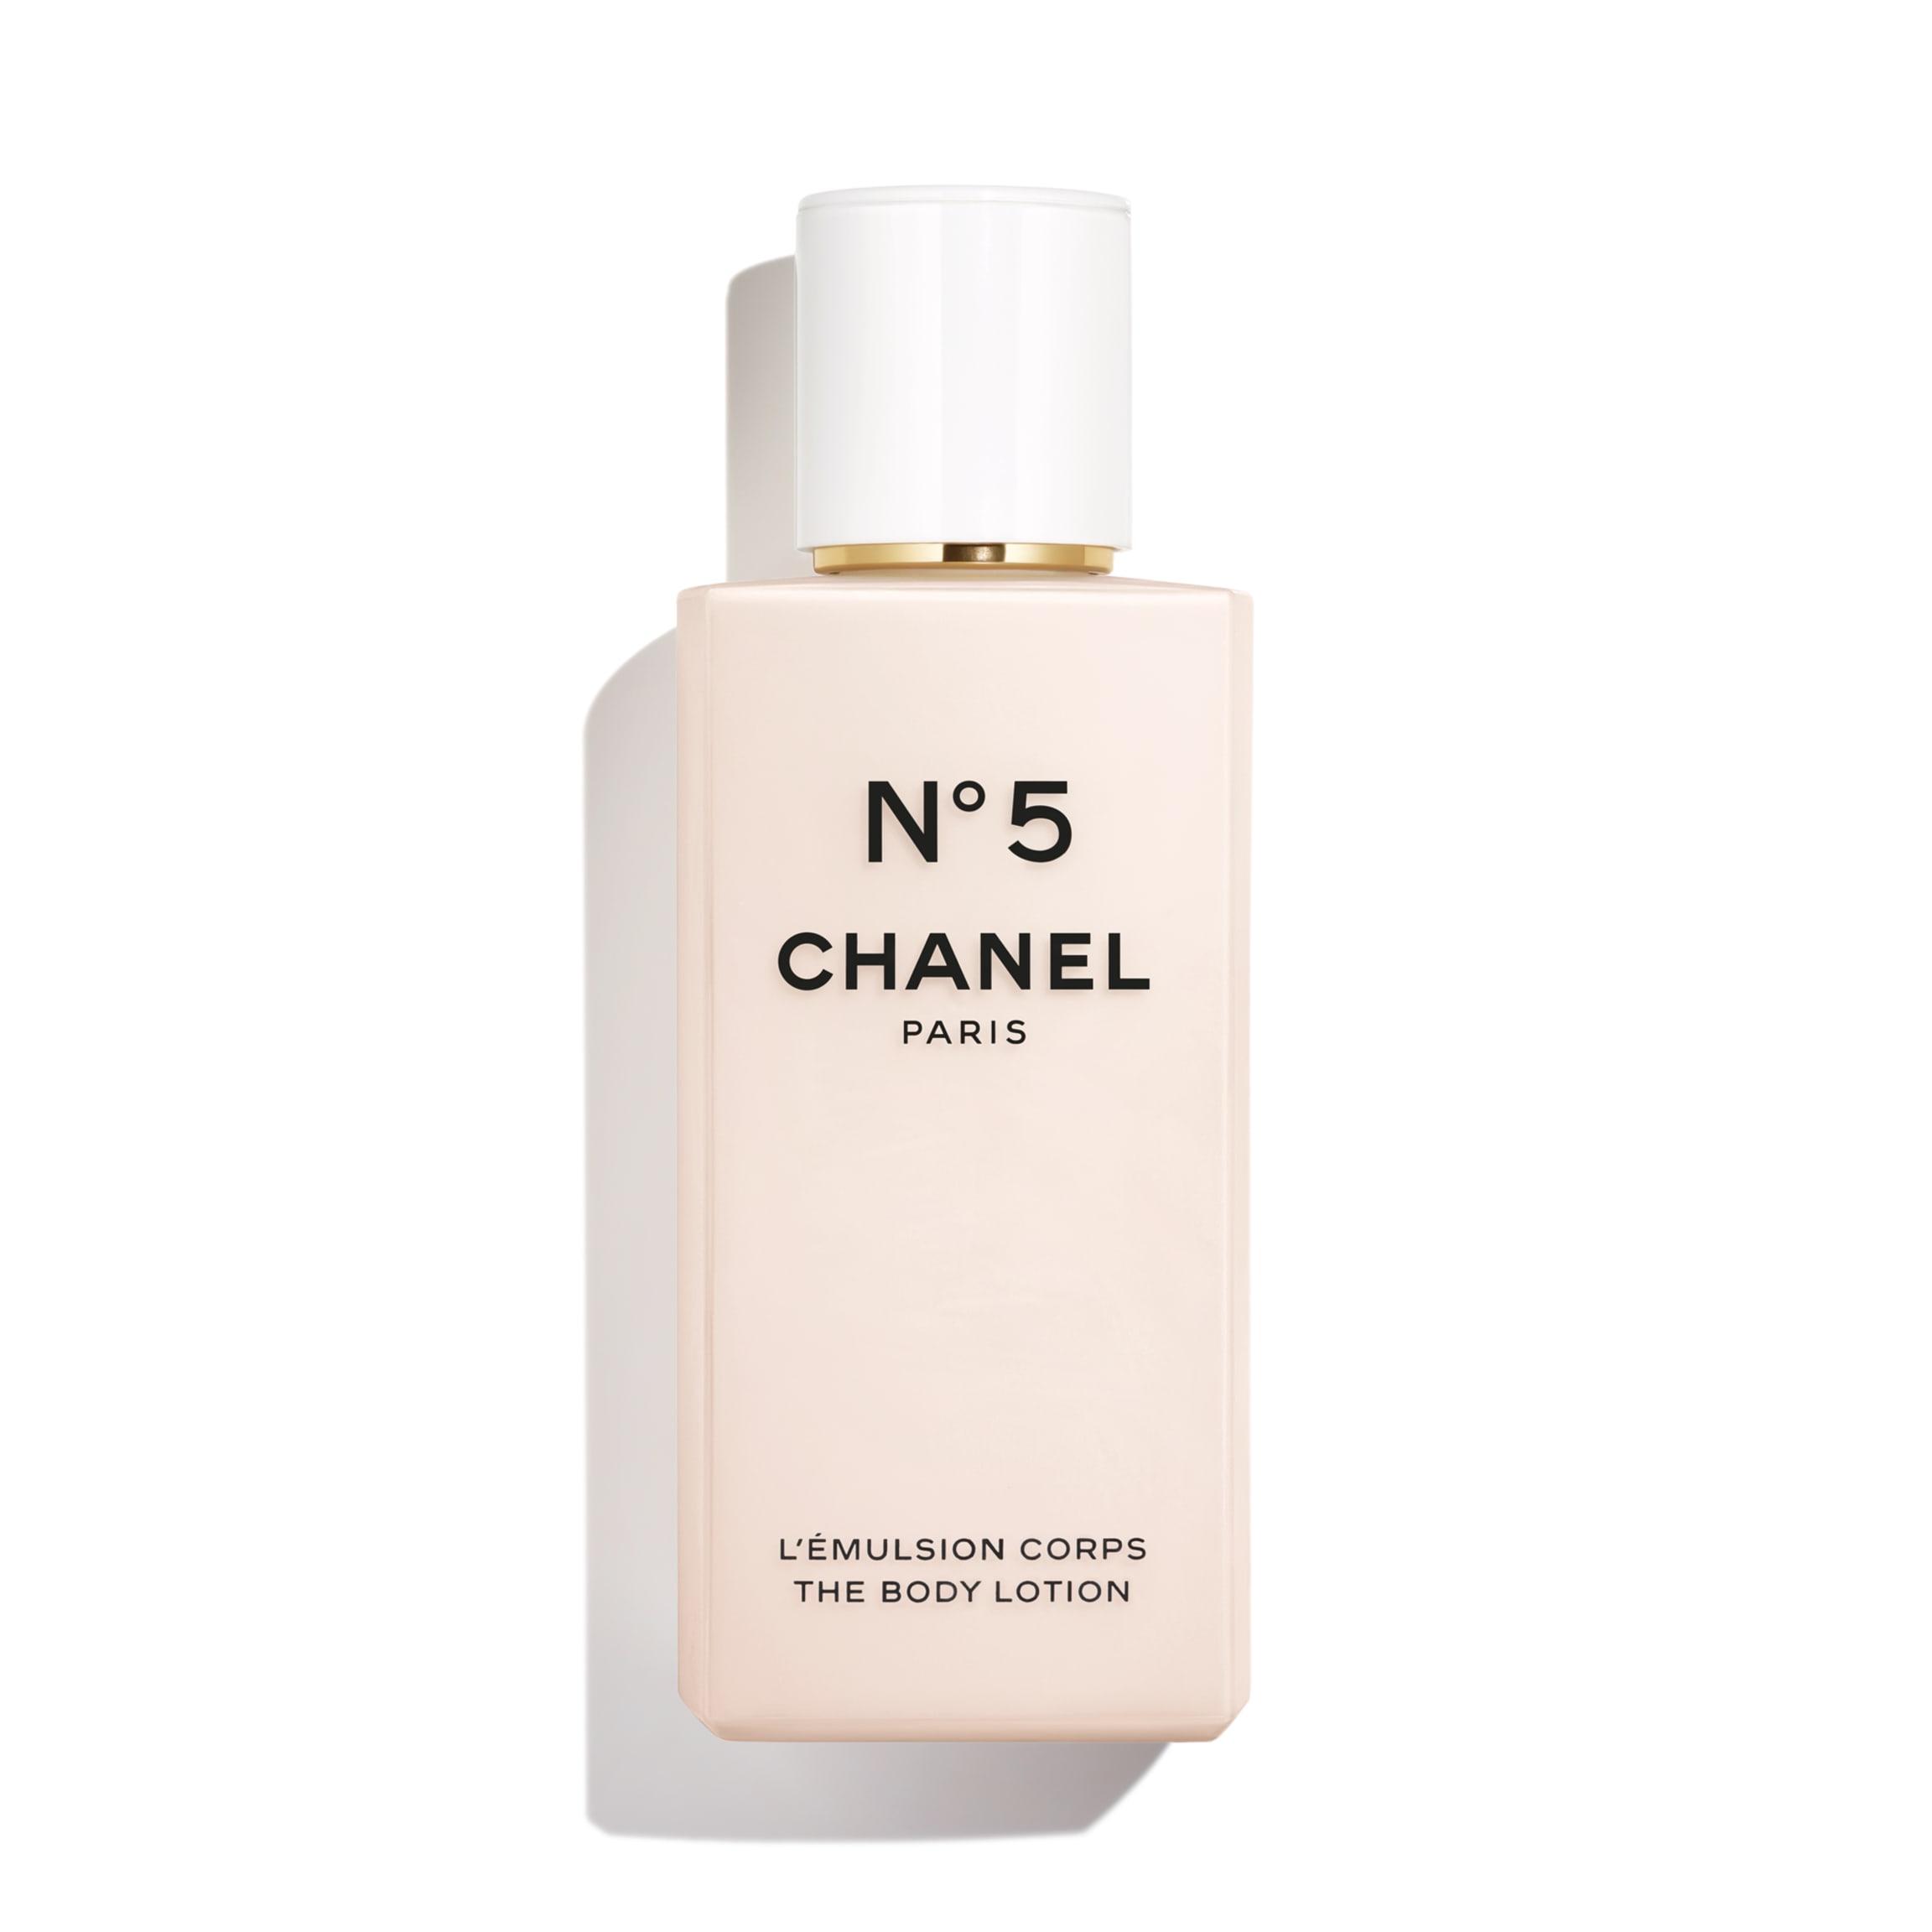 N 5 Perfume Fragrance Chanel